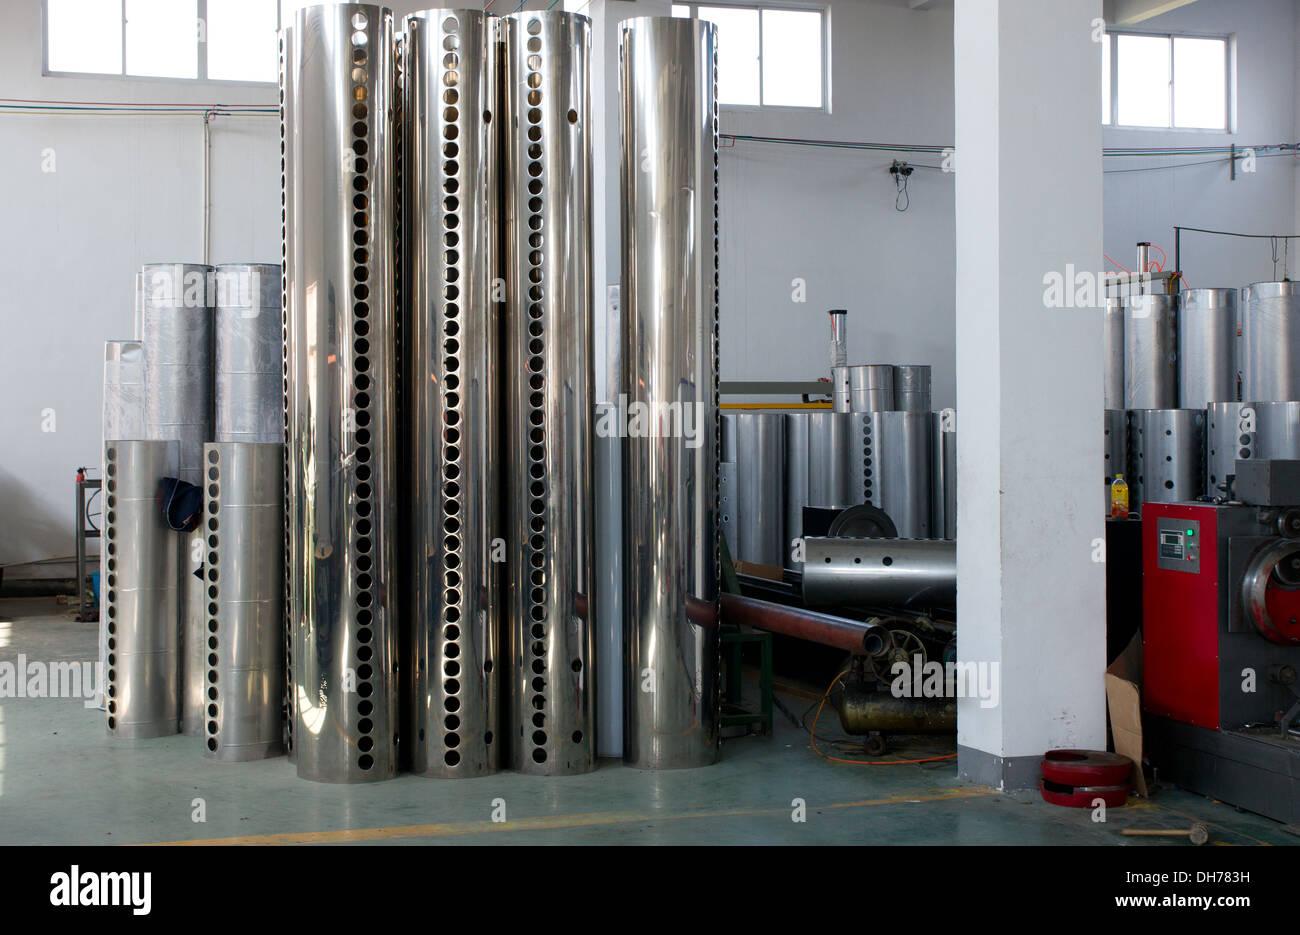 Tanques de calentadores de agua solares de tubo de vacío Imagen De Stock